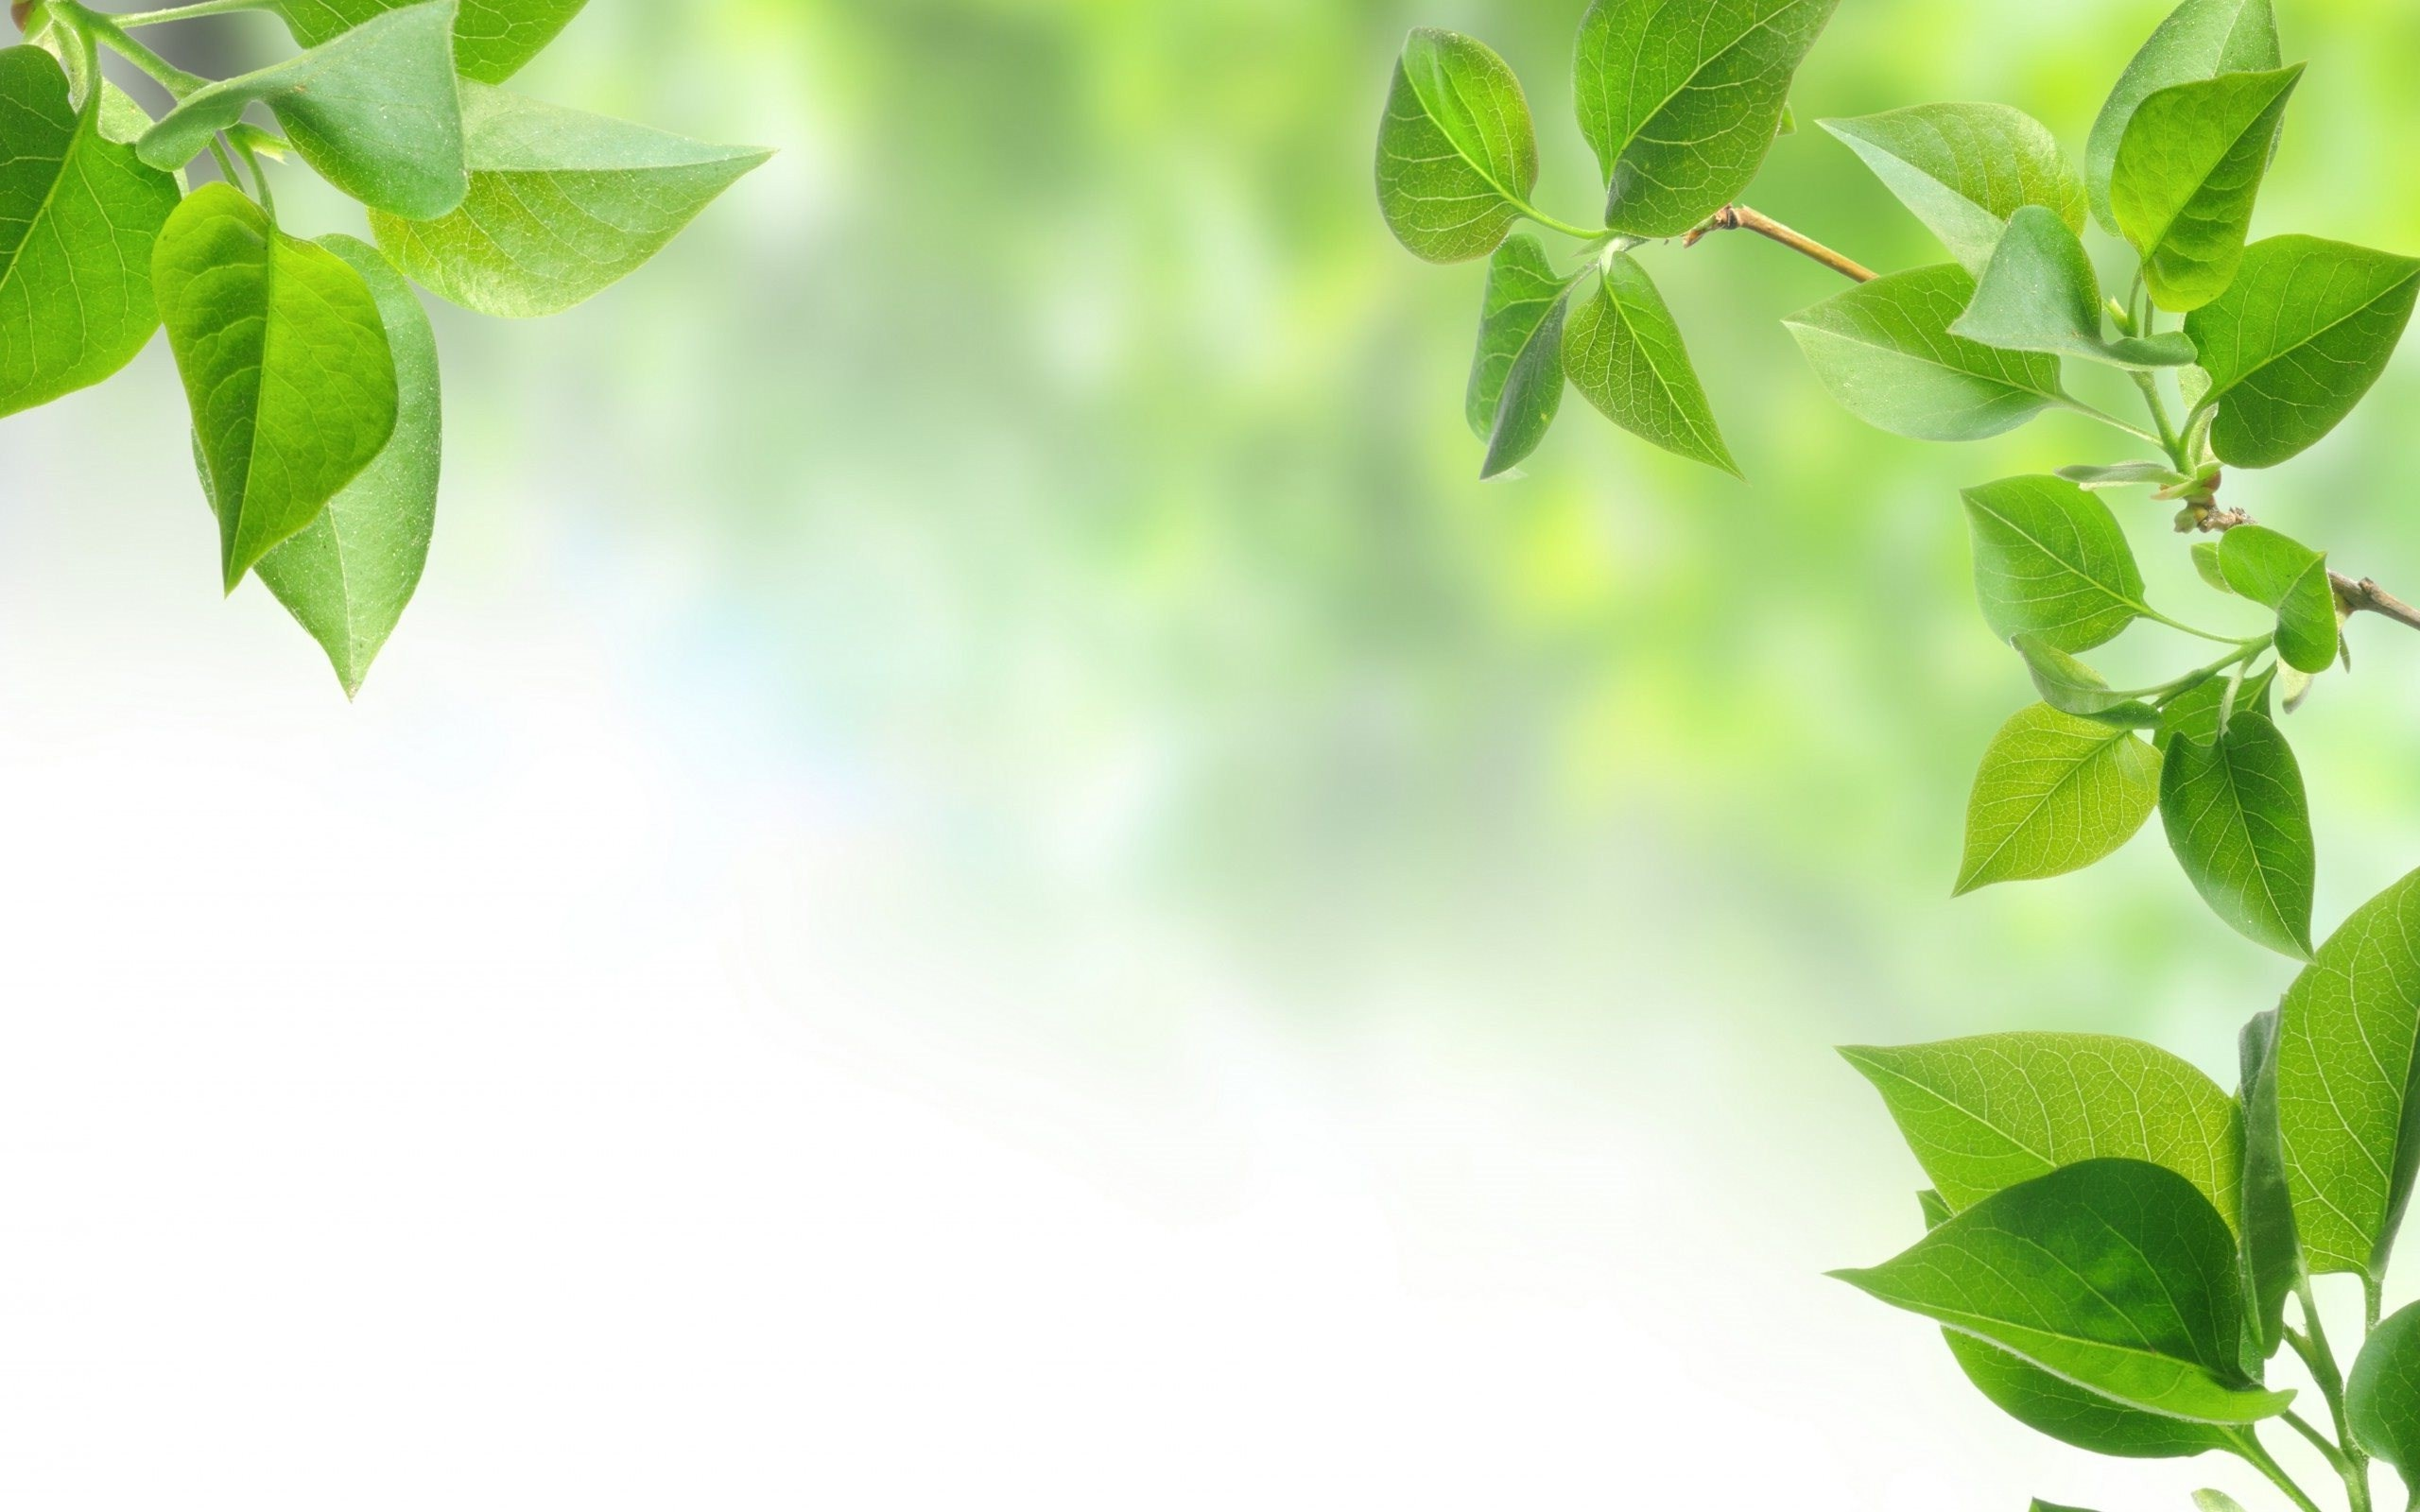 leaf hd leaves background nature vertical 2213